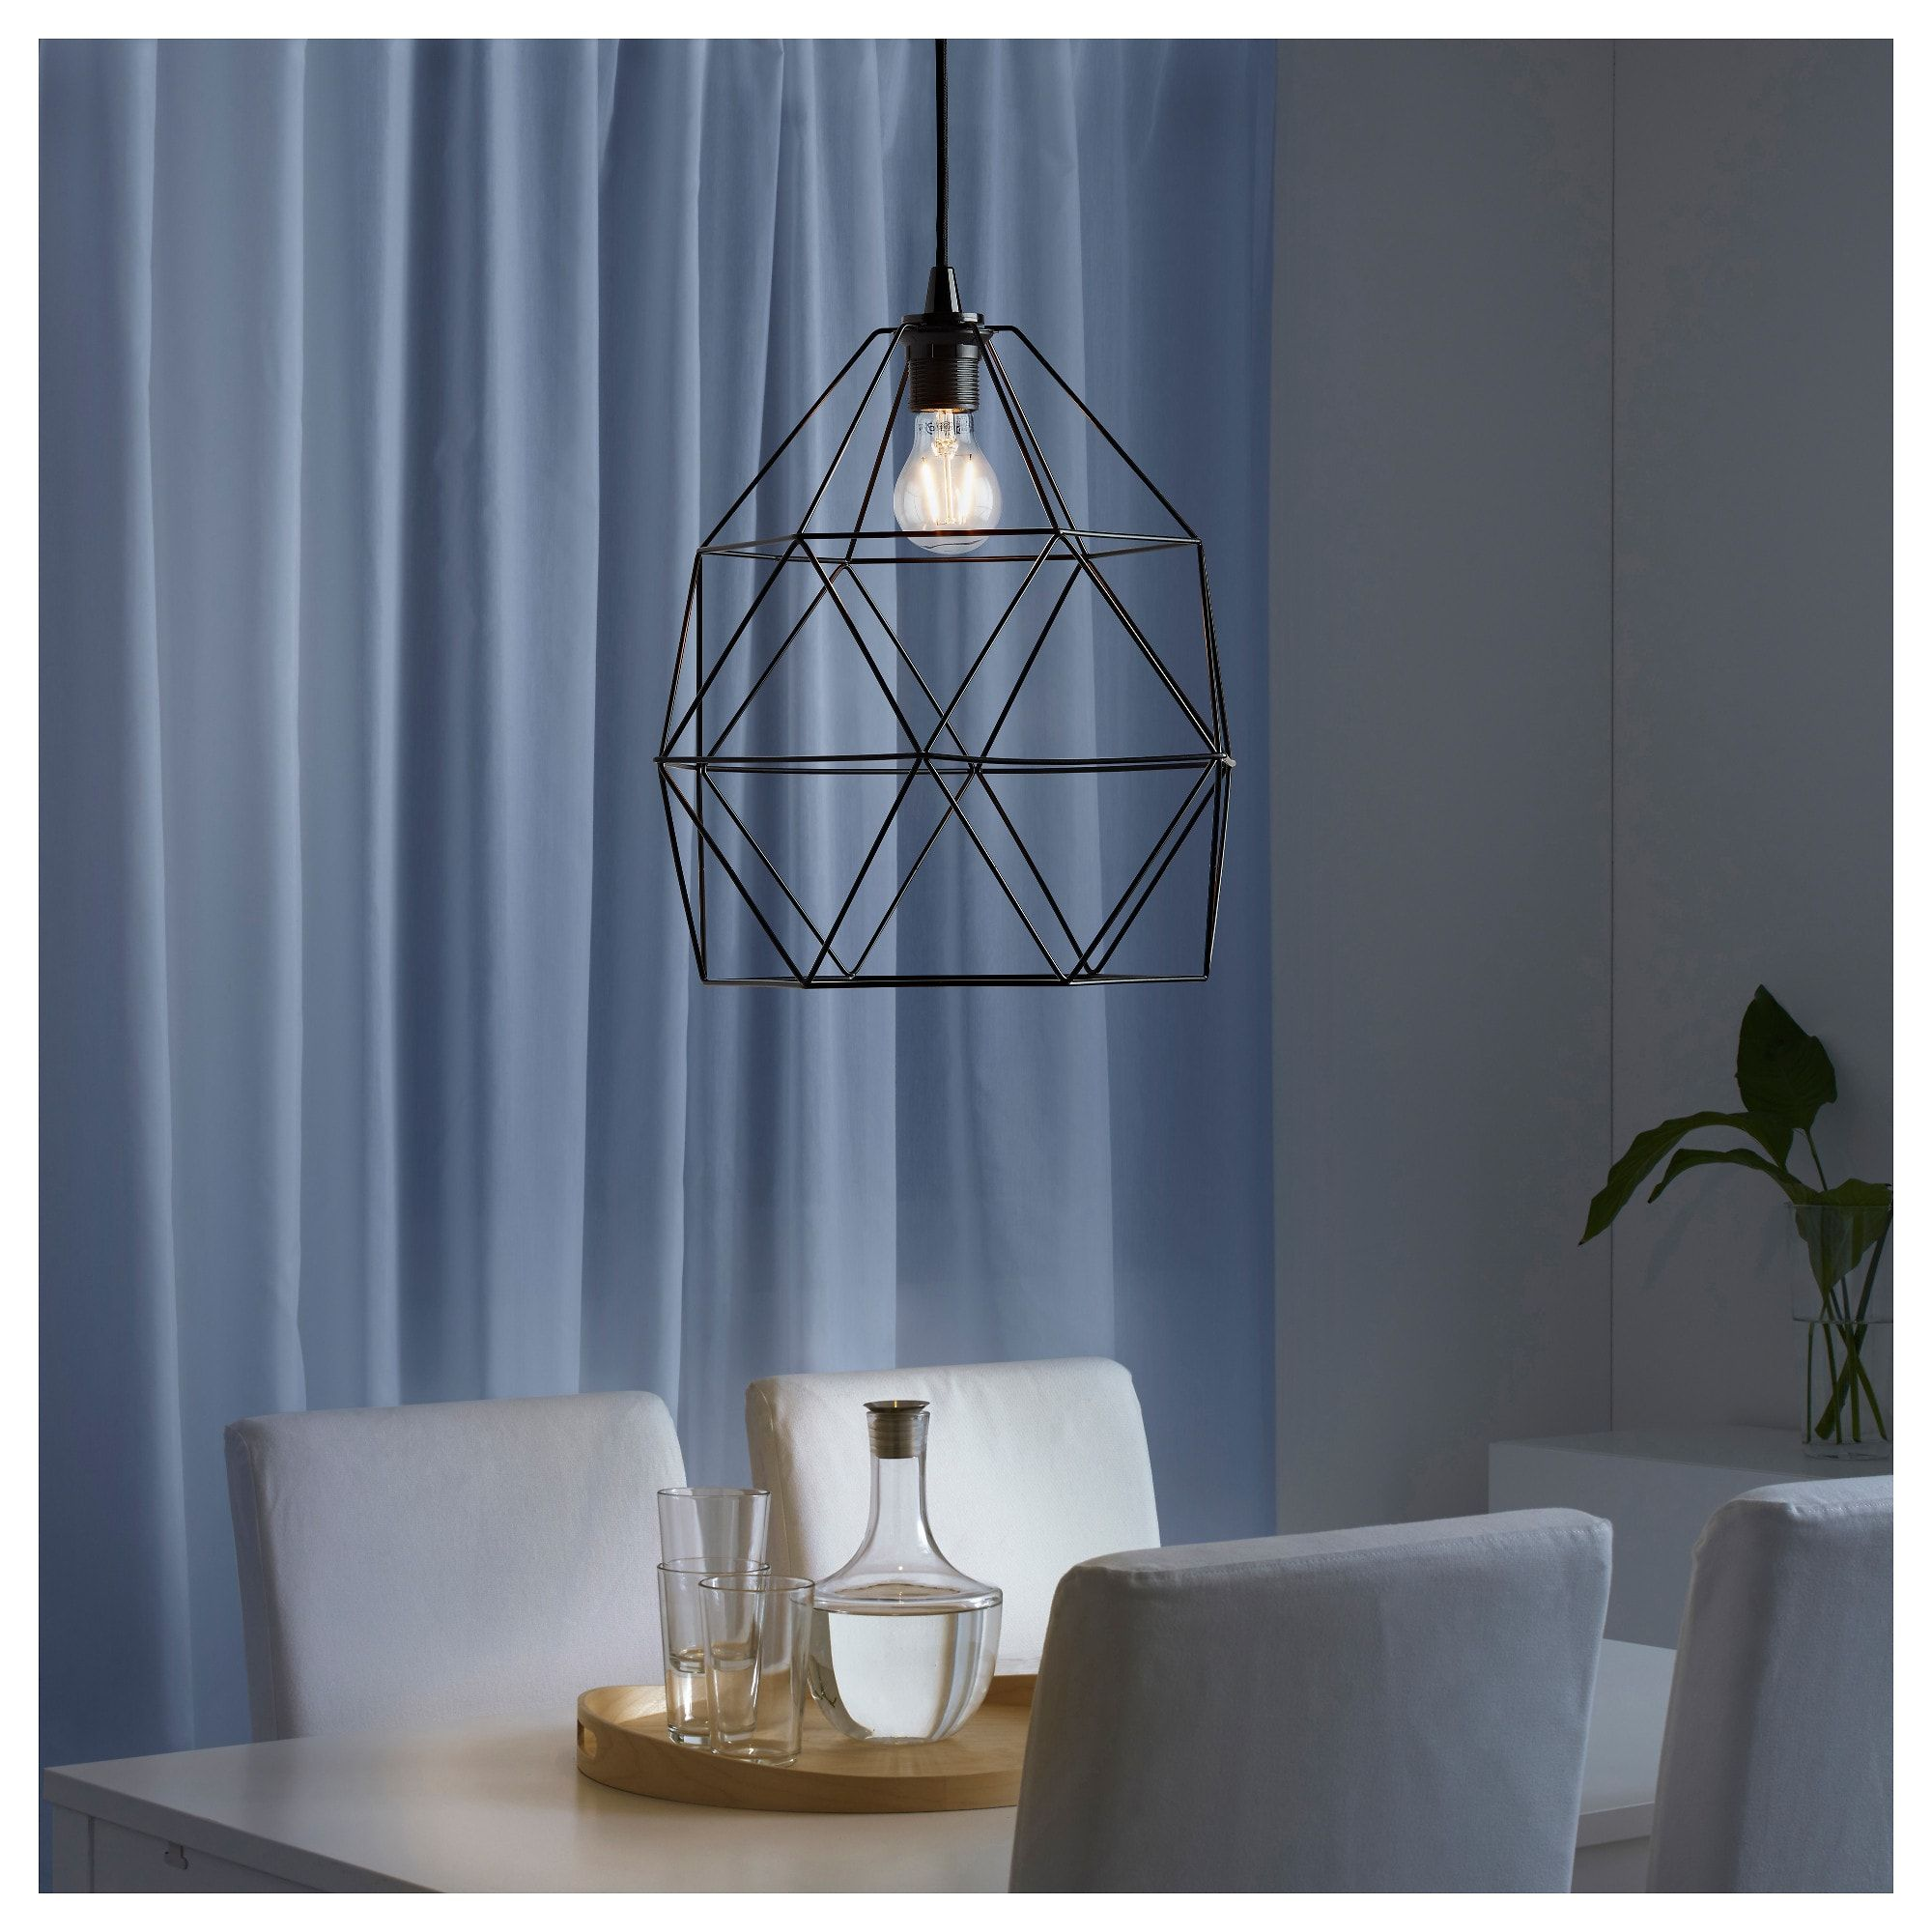 ikea ceiling lighting, ikea ceiling insulation, ikea ceiling spotlights, on ikea ceiling light wiring diagram